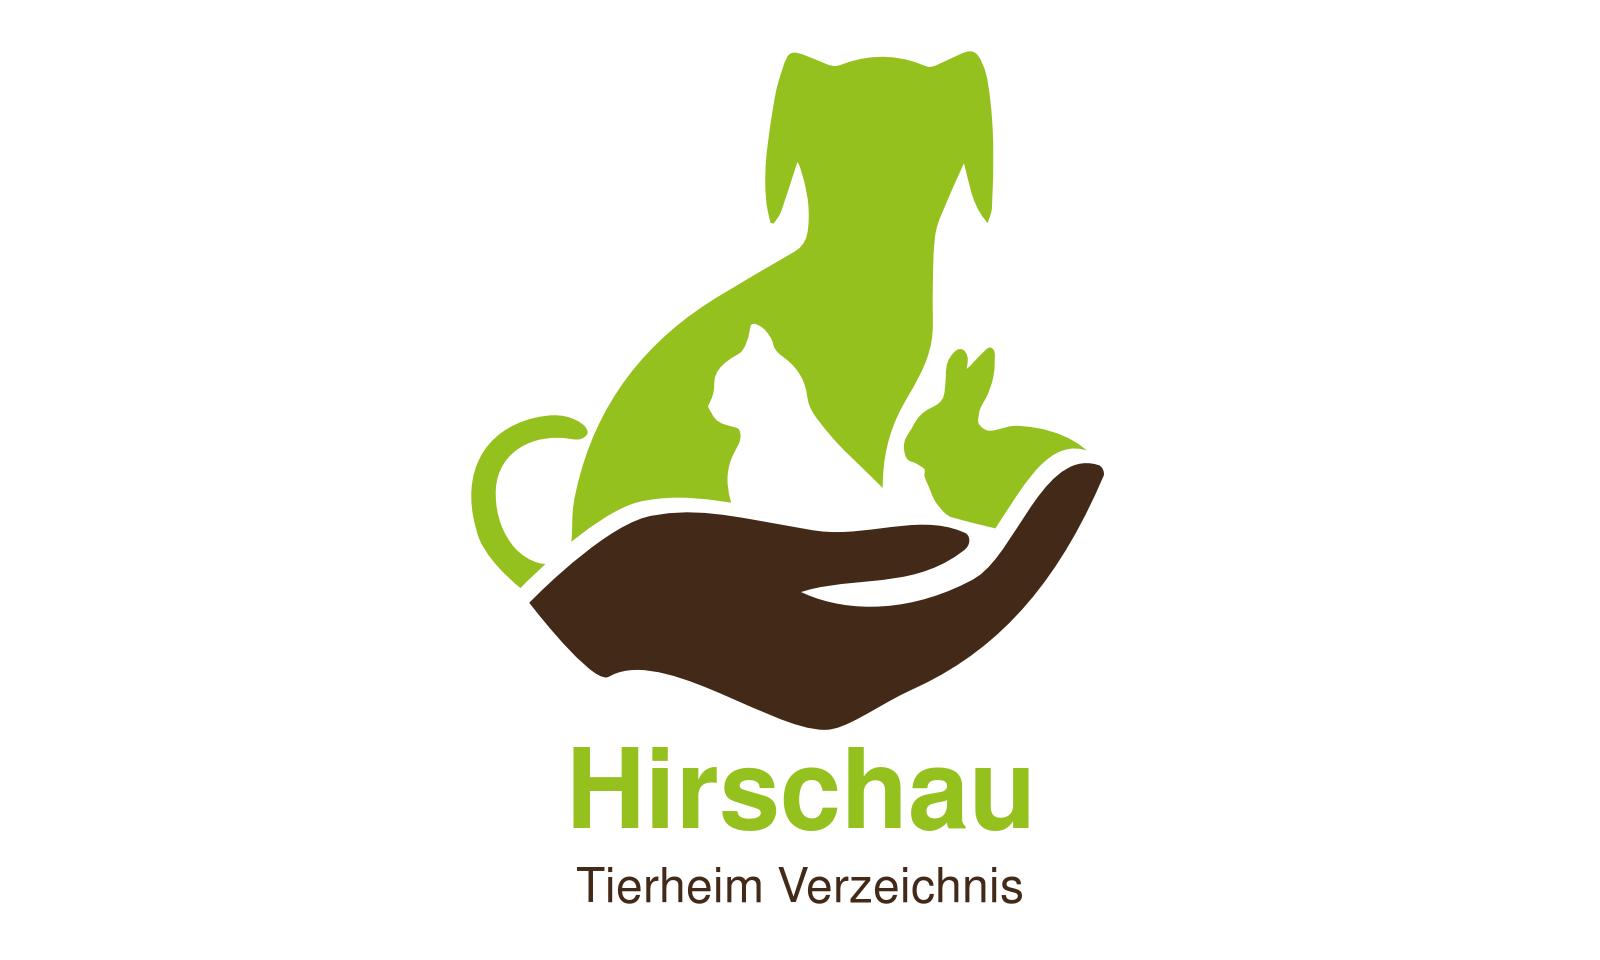 Tierheim Hirschau